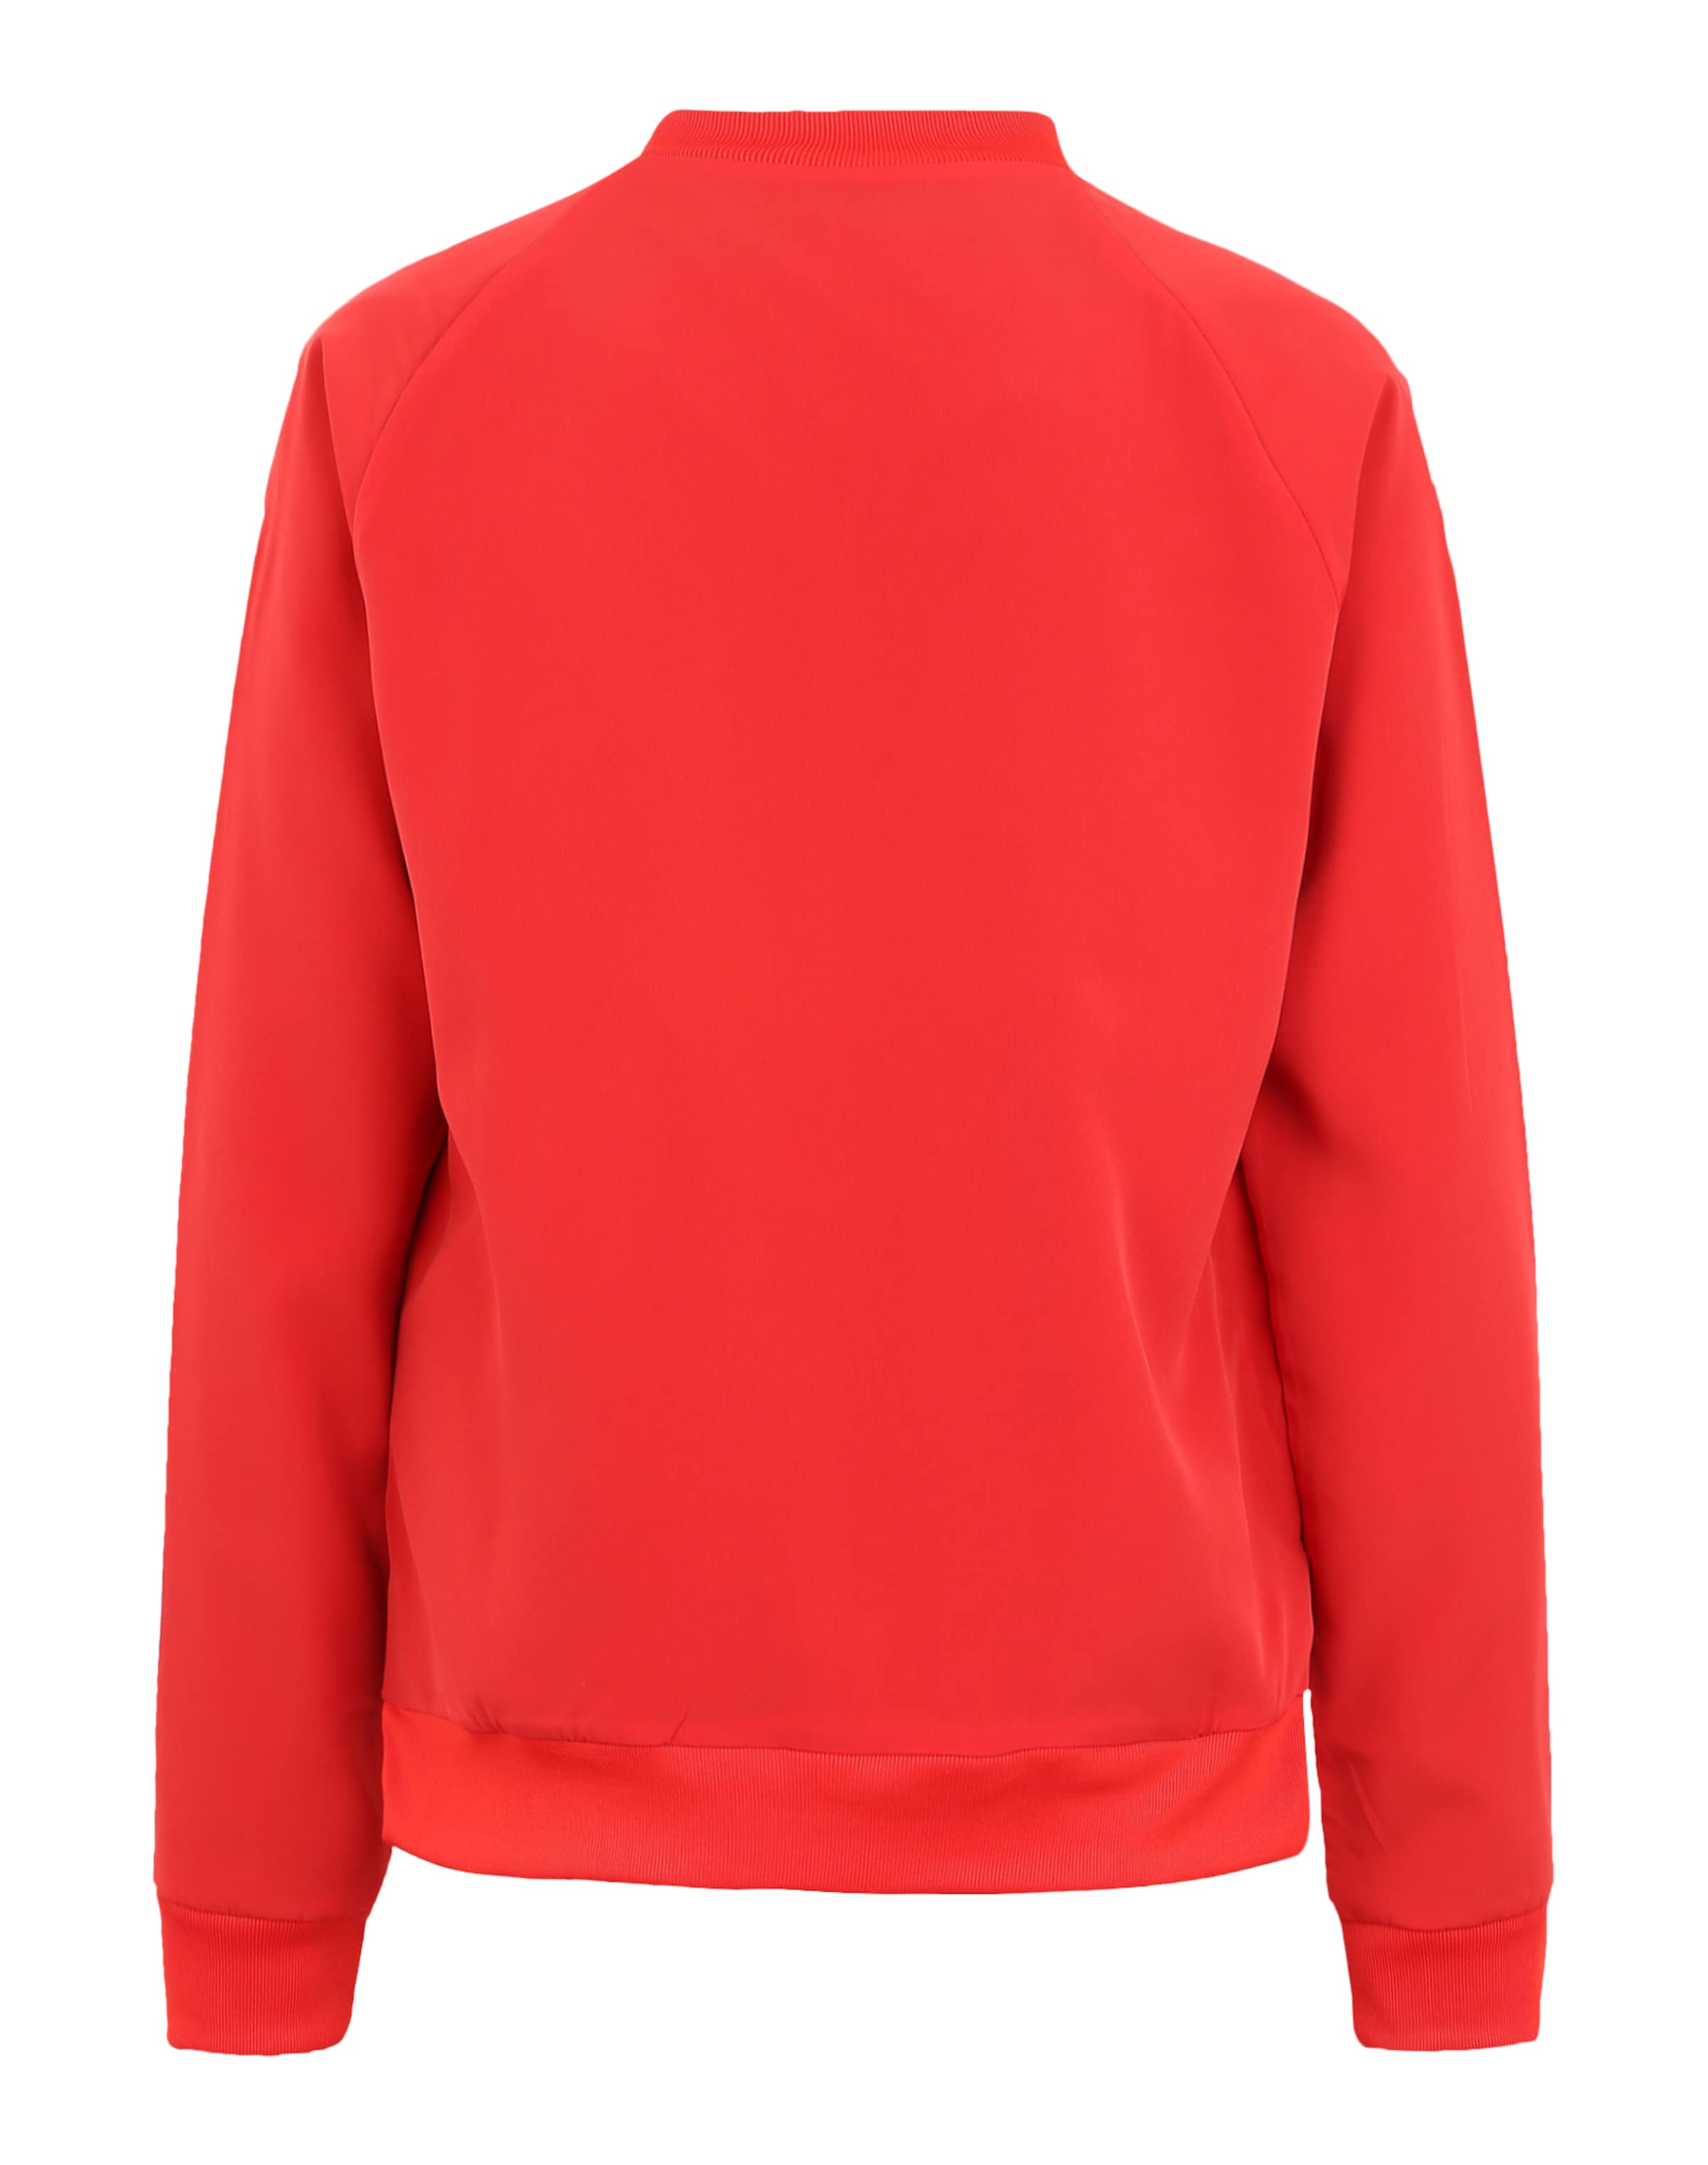 In Originals Rot Adidas Bomberjacke Adidas Bomberjacke Originals E9IeHb2YWD